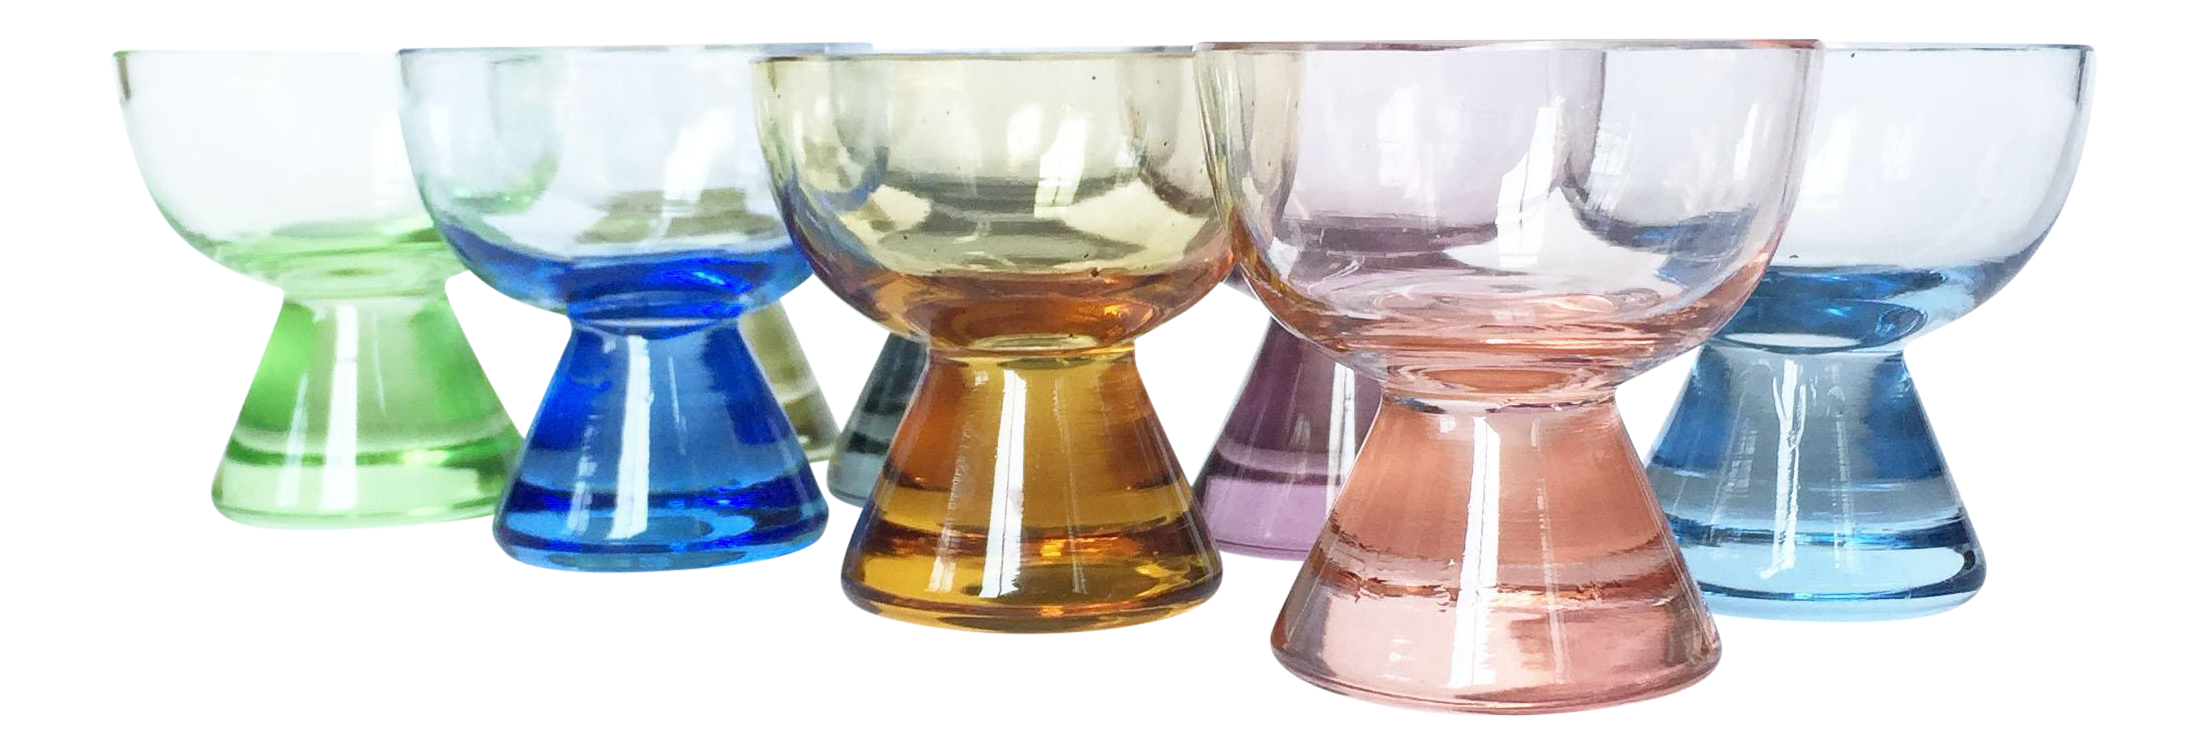 set-of-8-colorful-vintage-cordials-8481.png